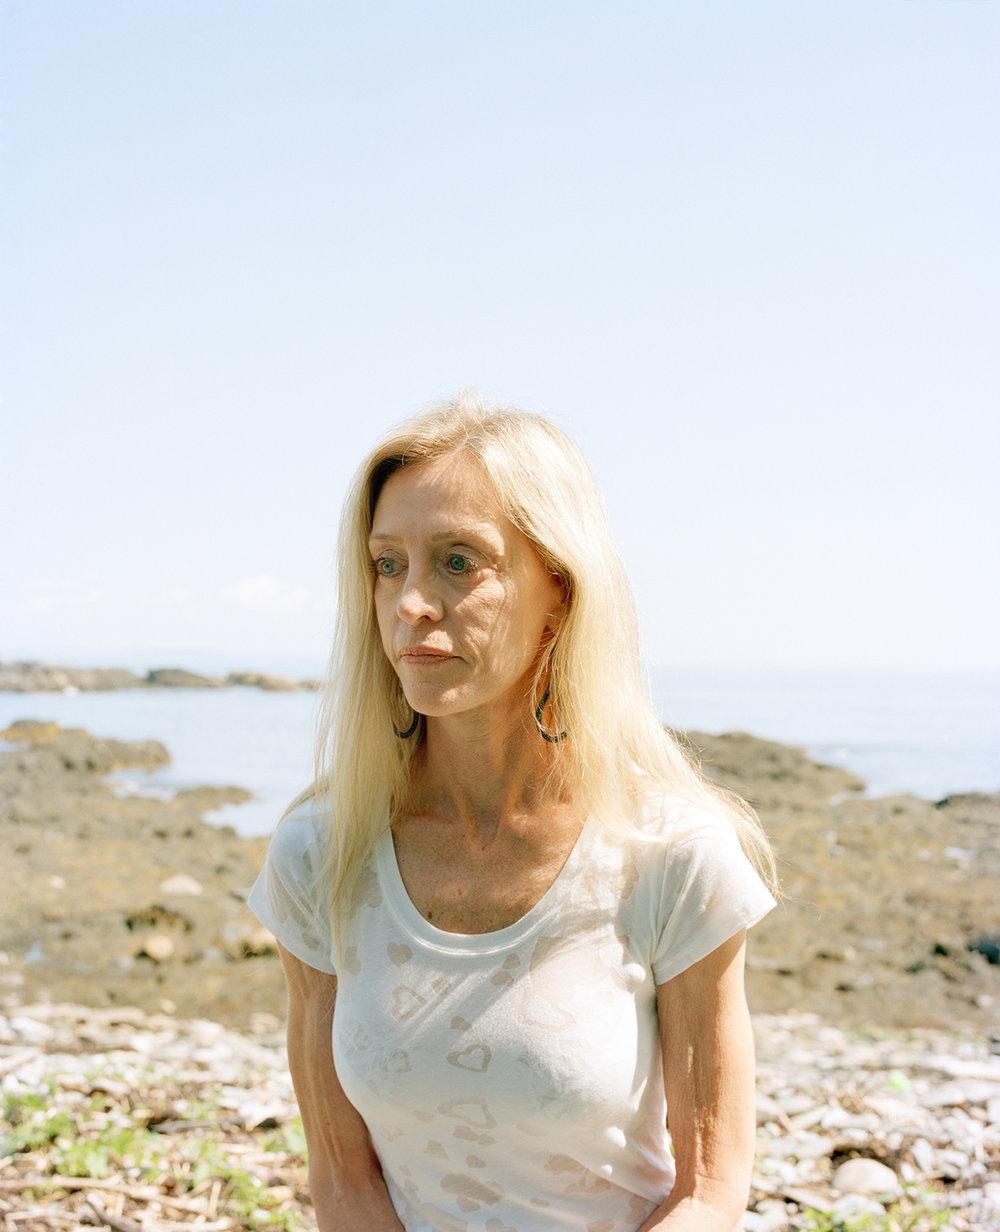 Lynn on Stony Beach